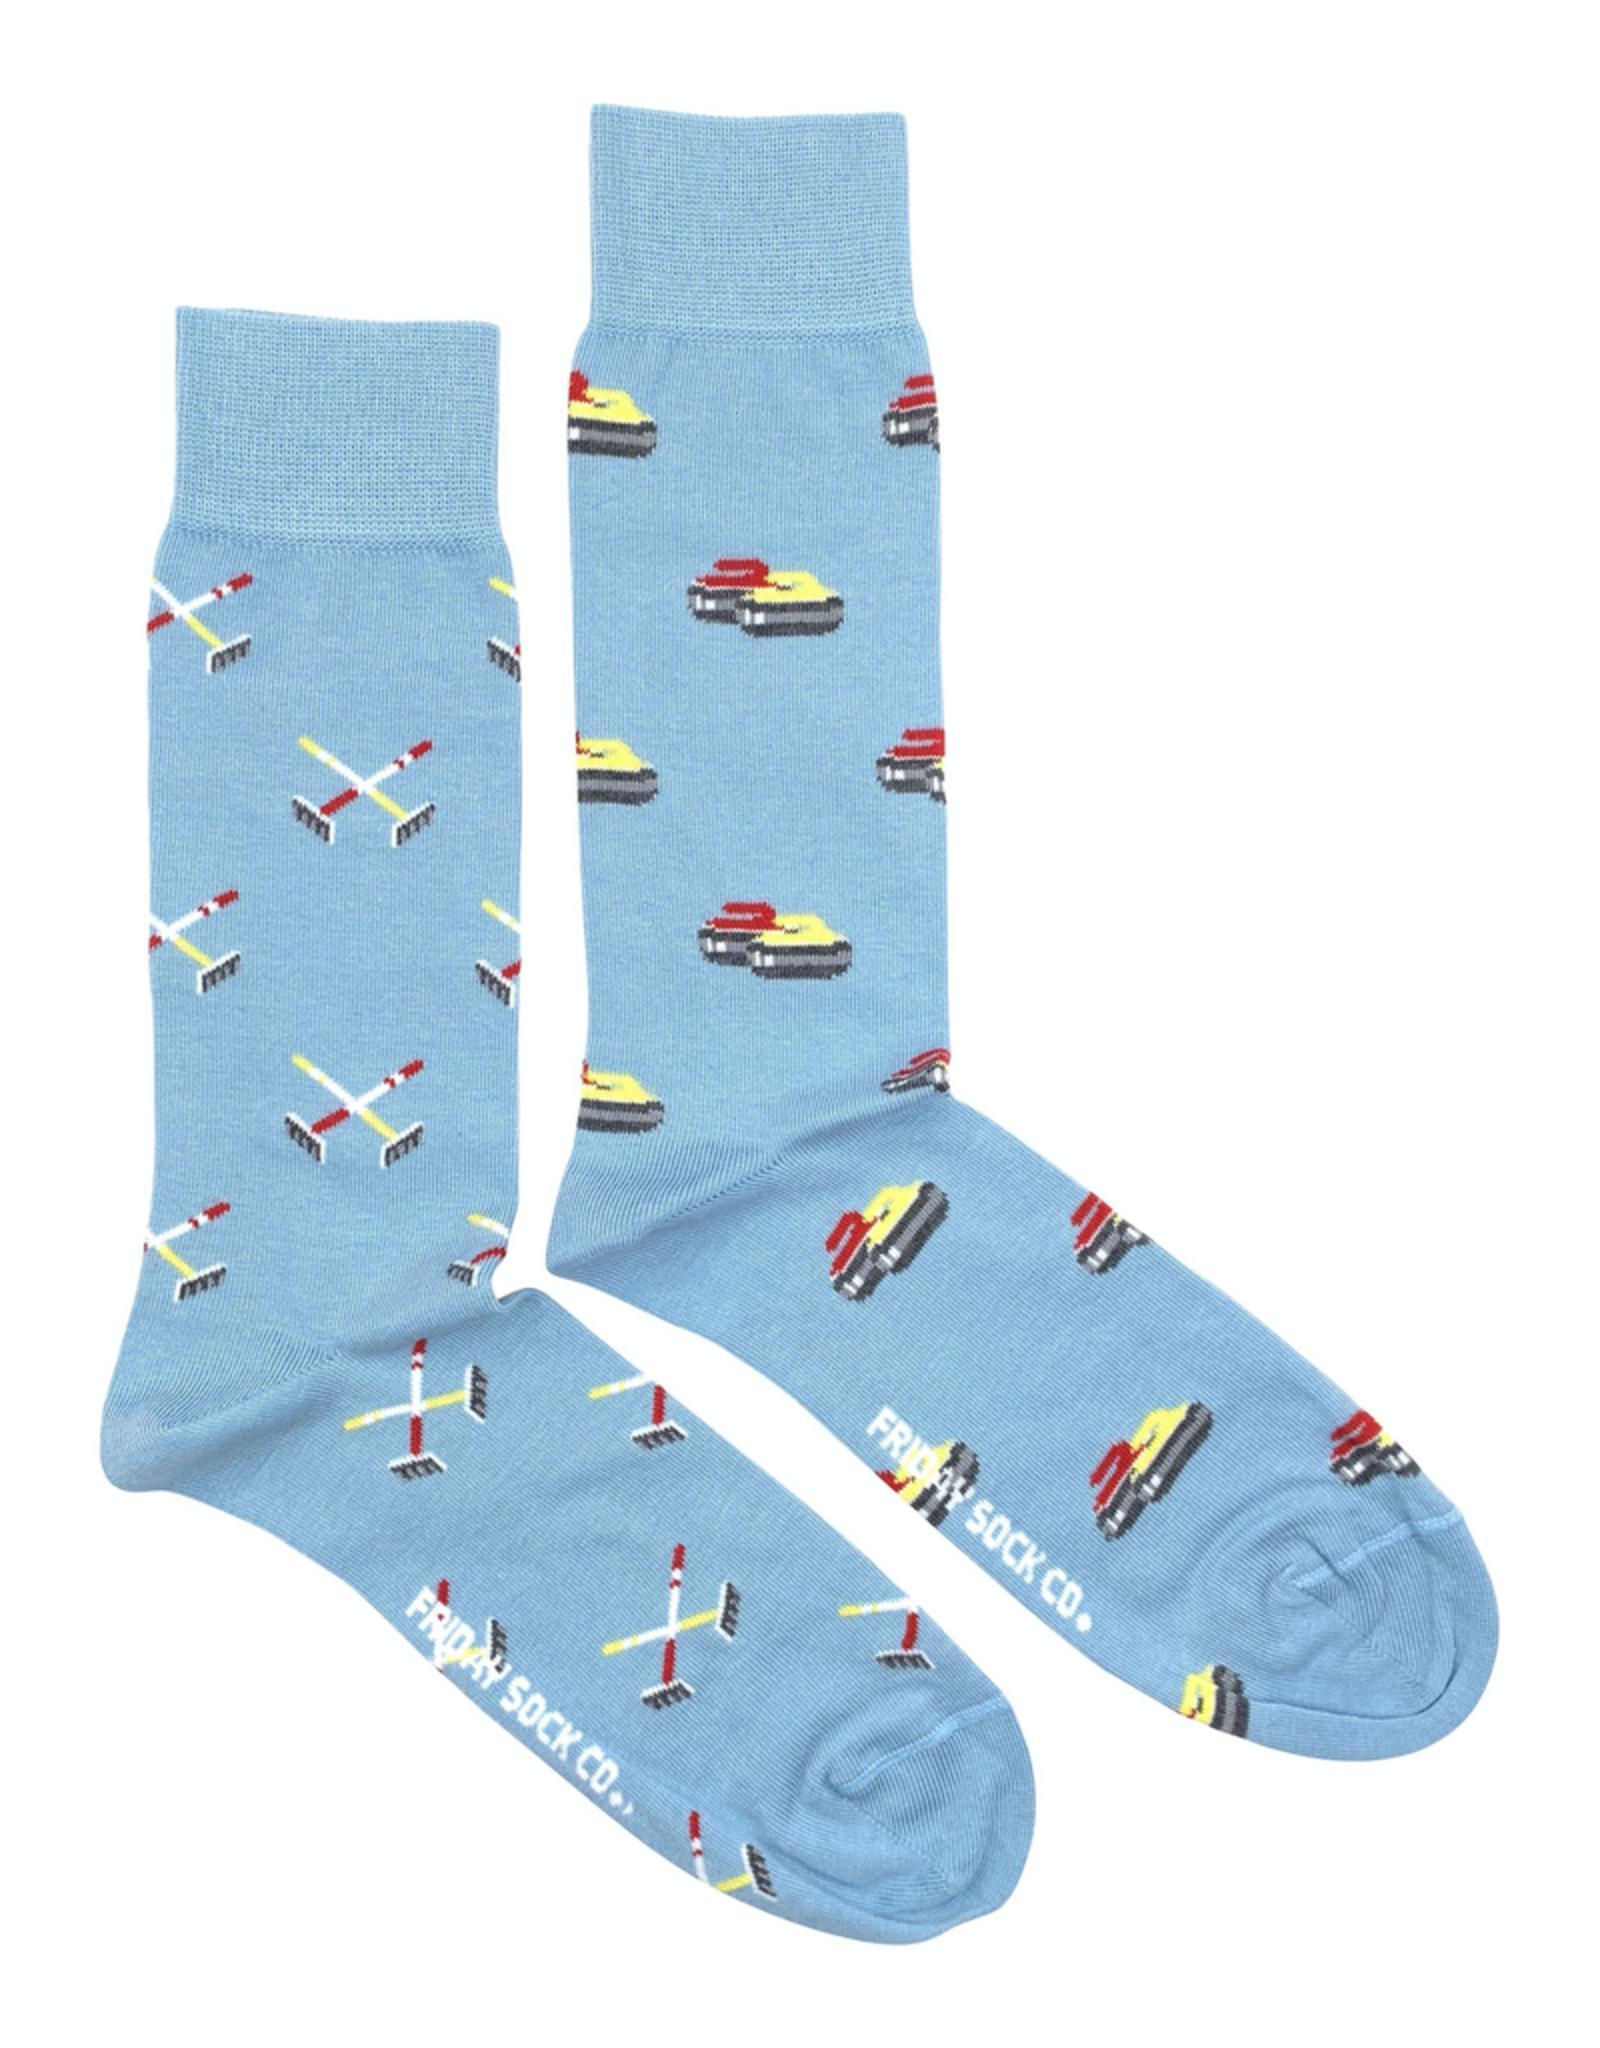 Rock And Broom Curling Socks